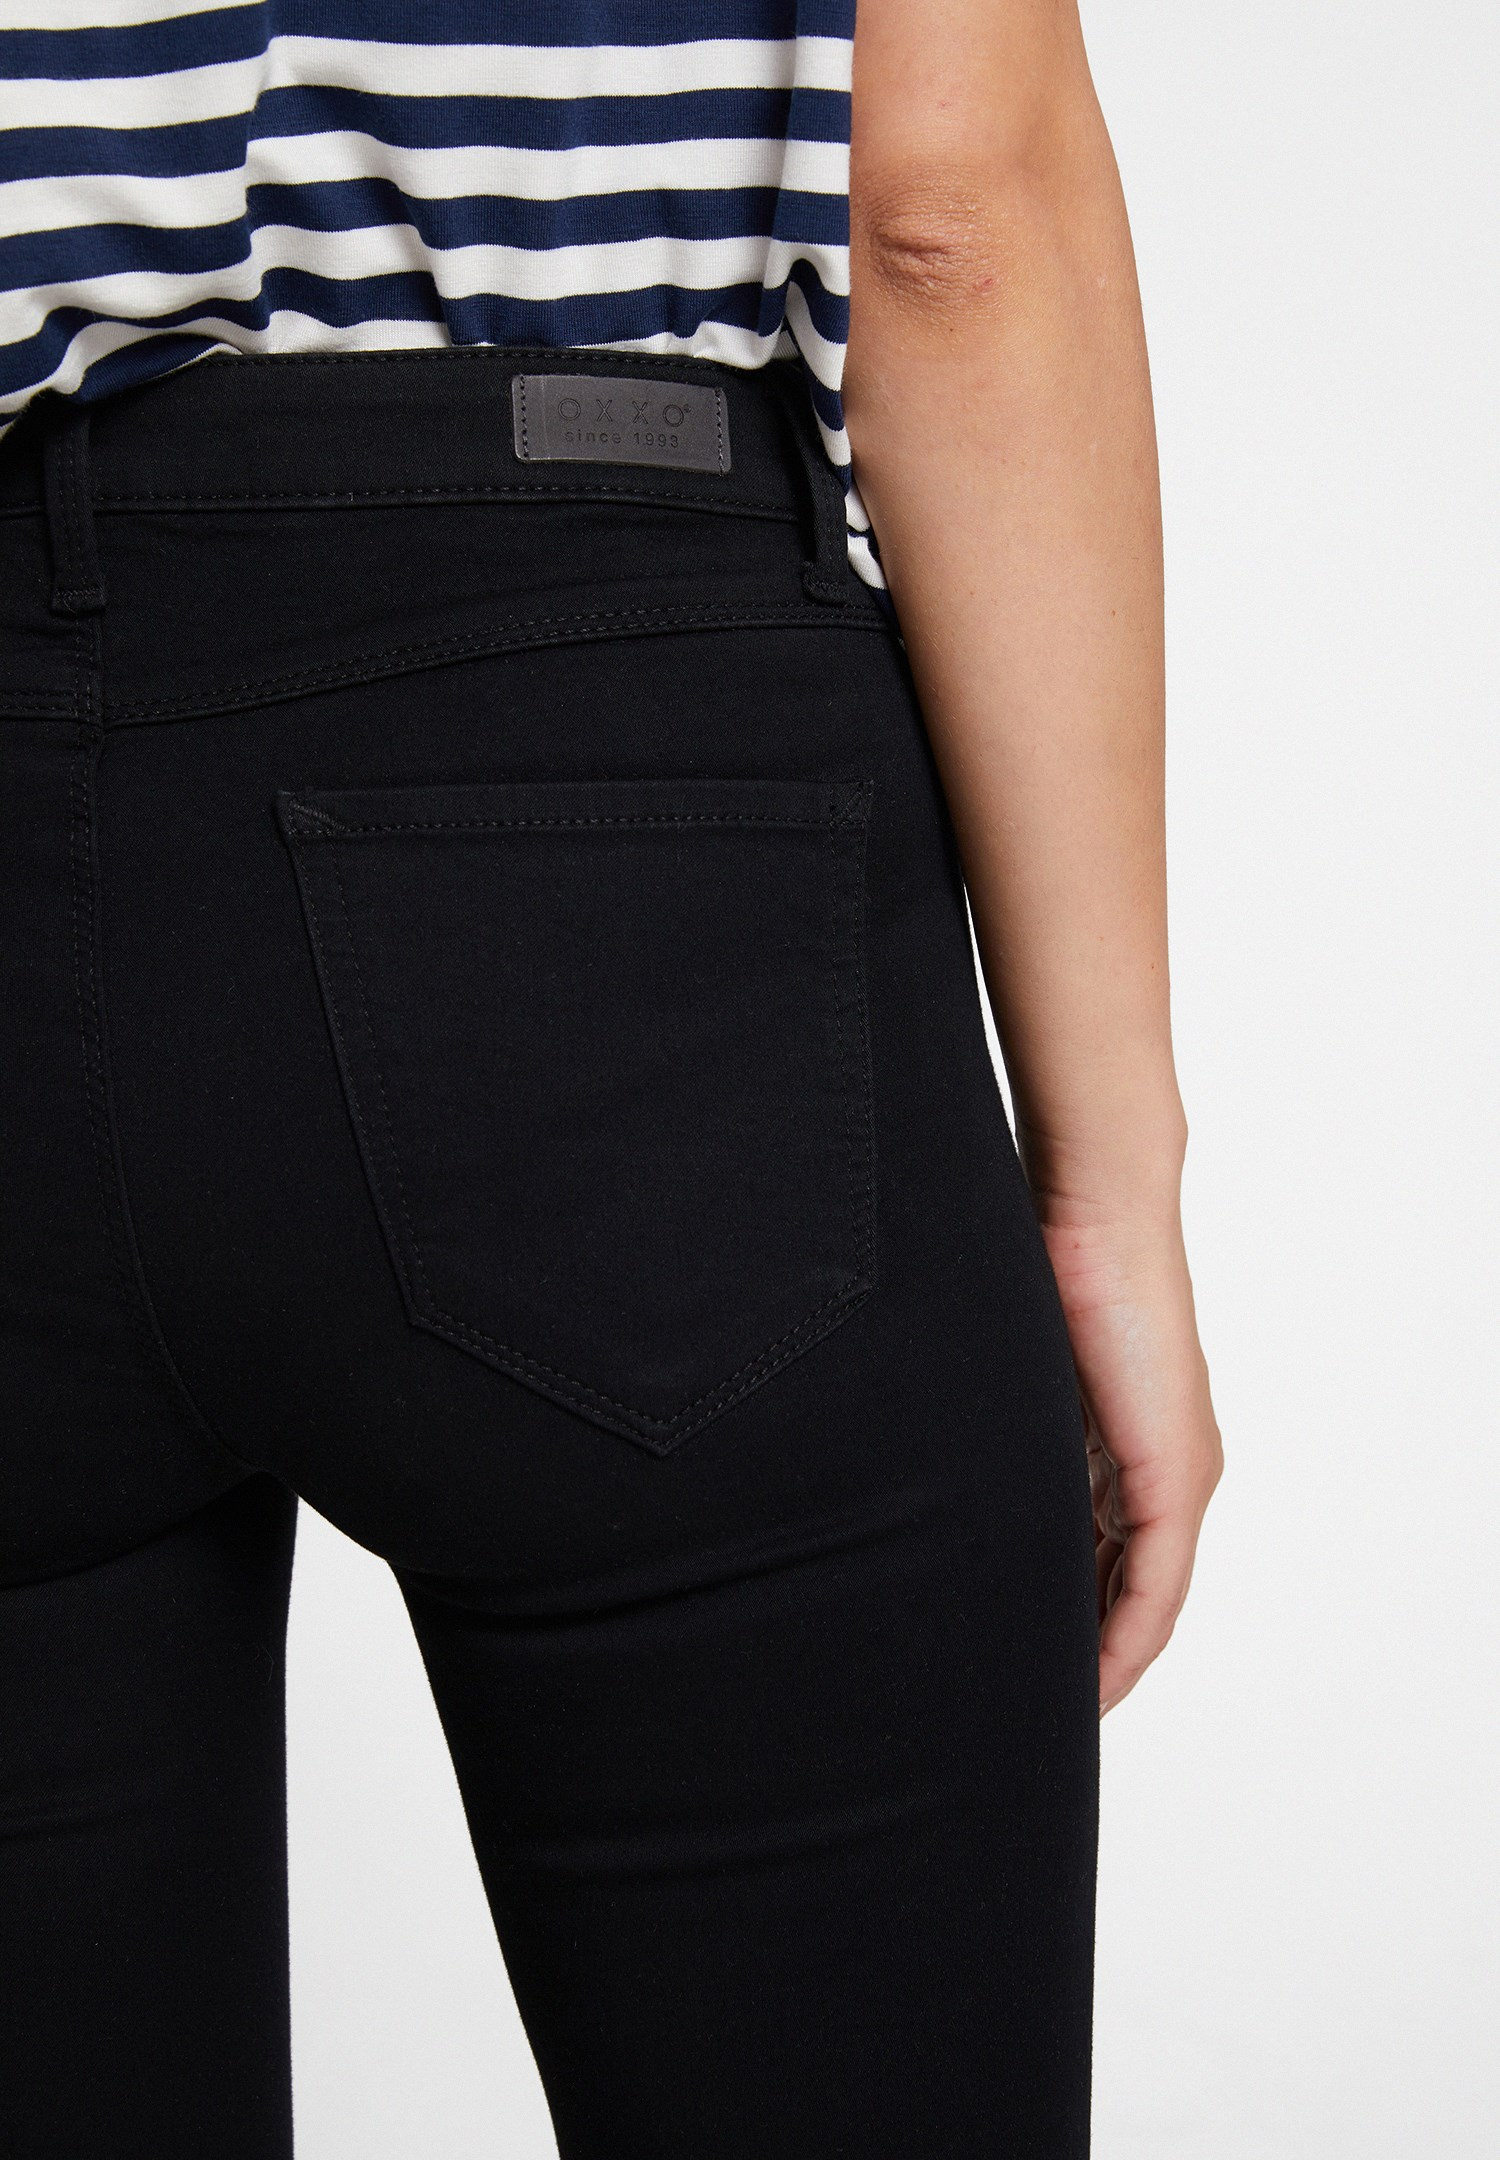 Bayan Siyah Orta Bel Cepli Pantolon